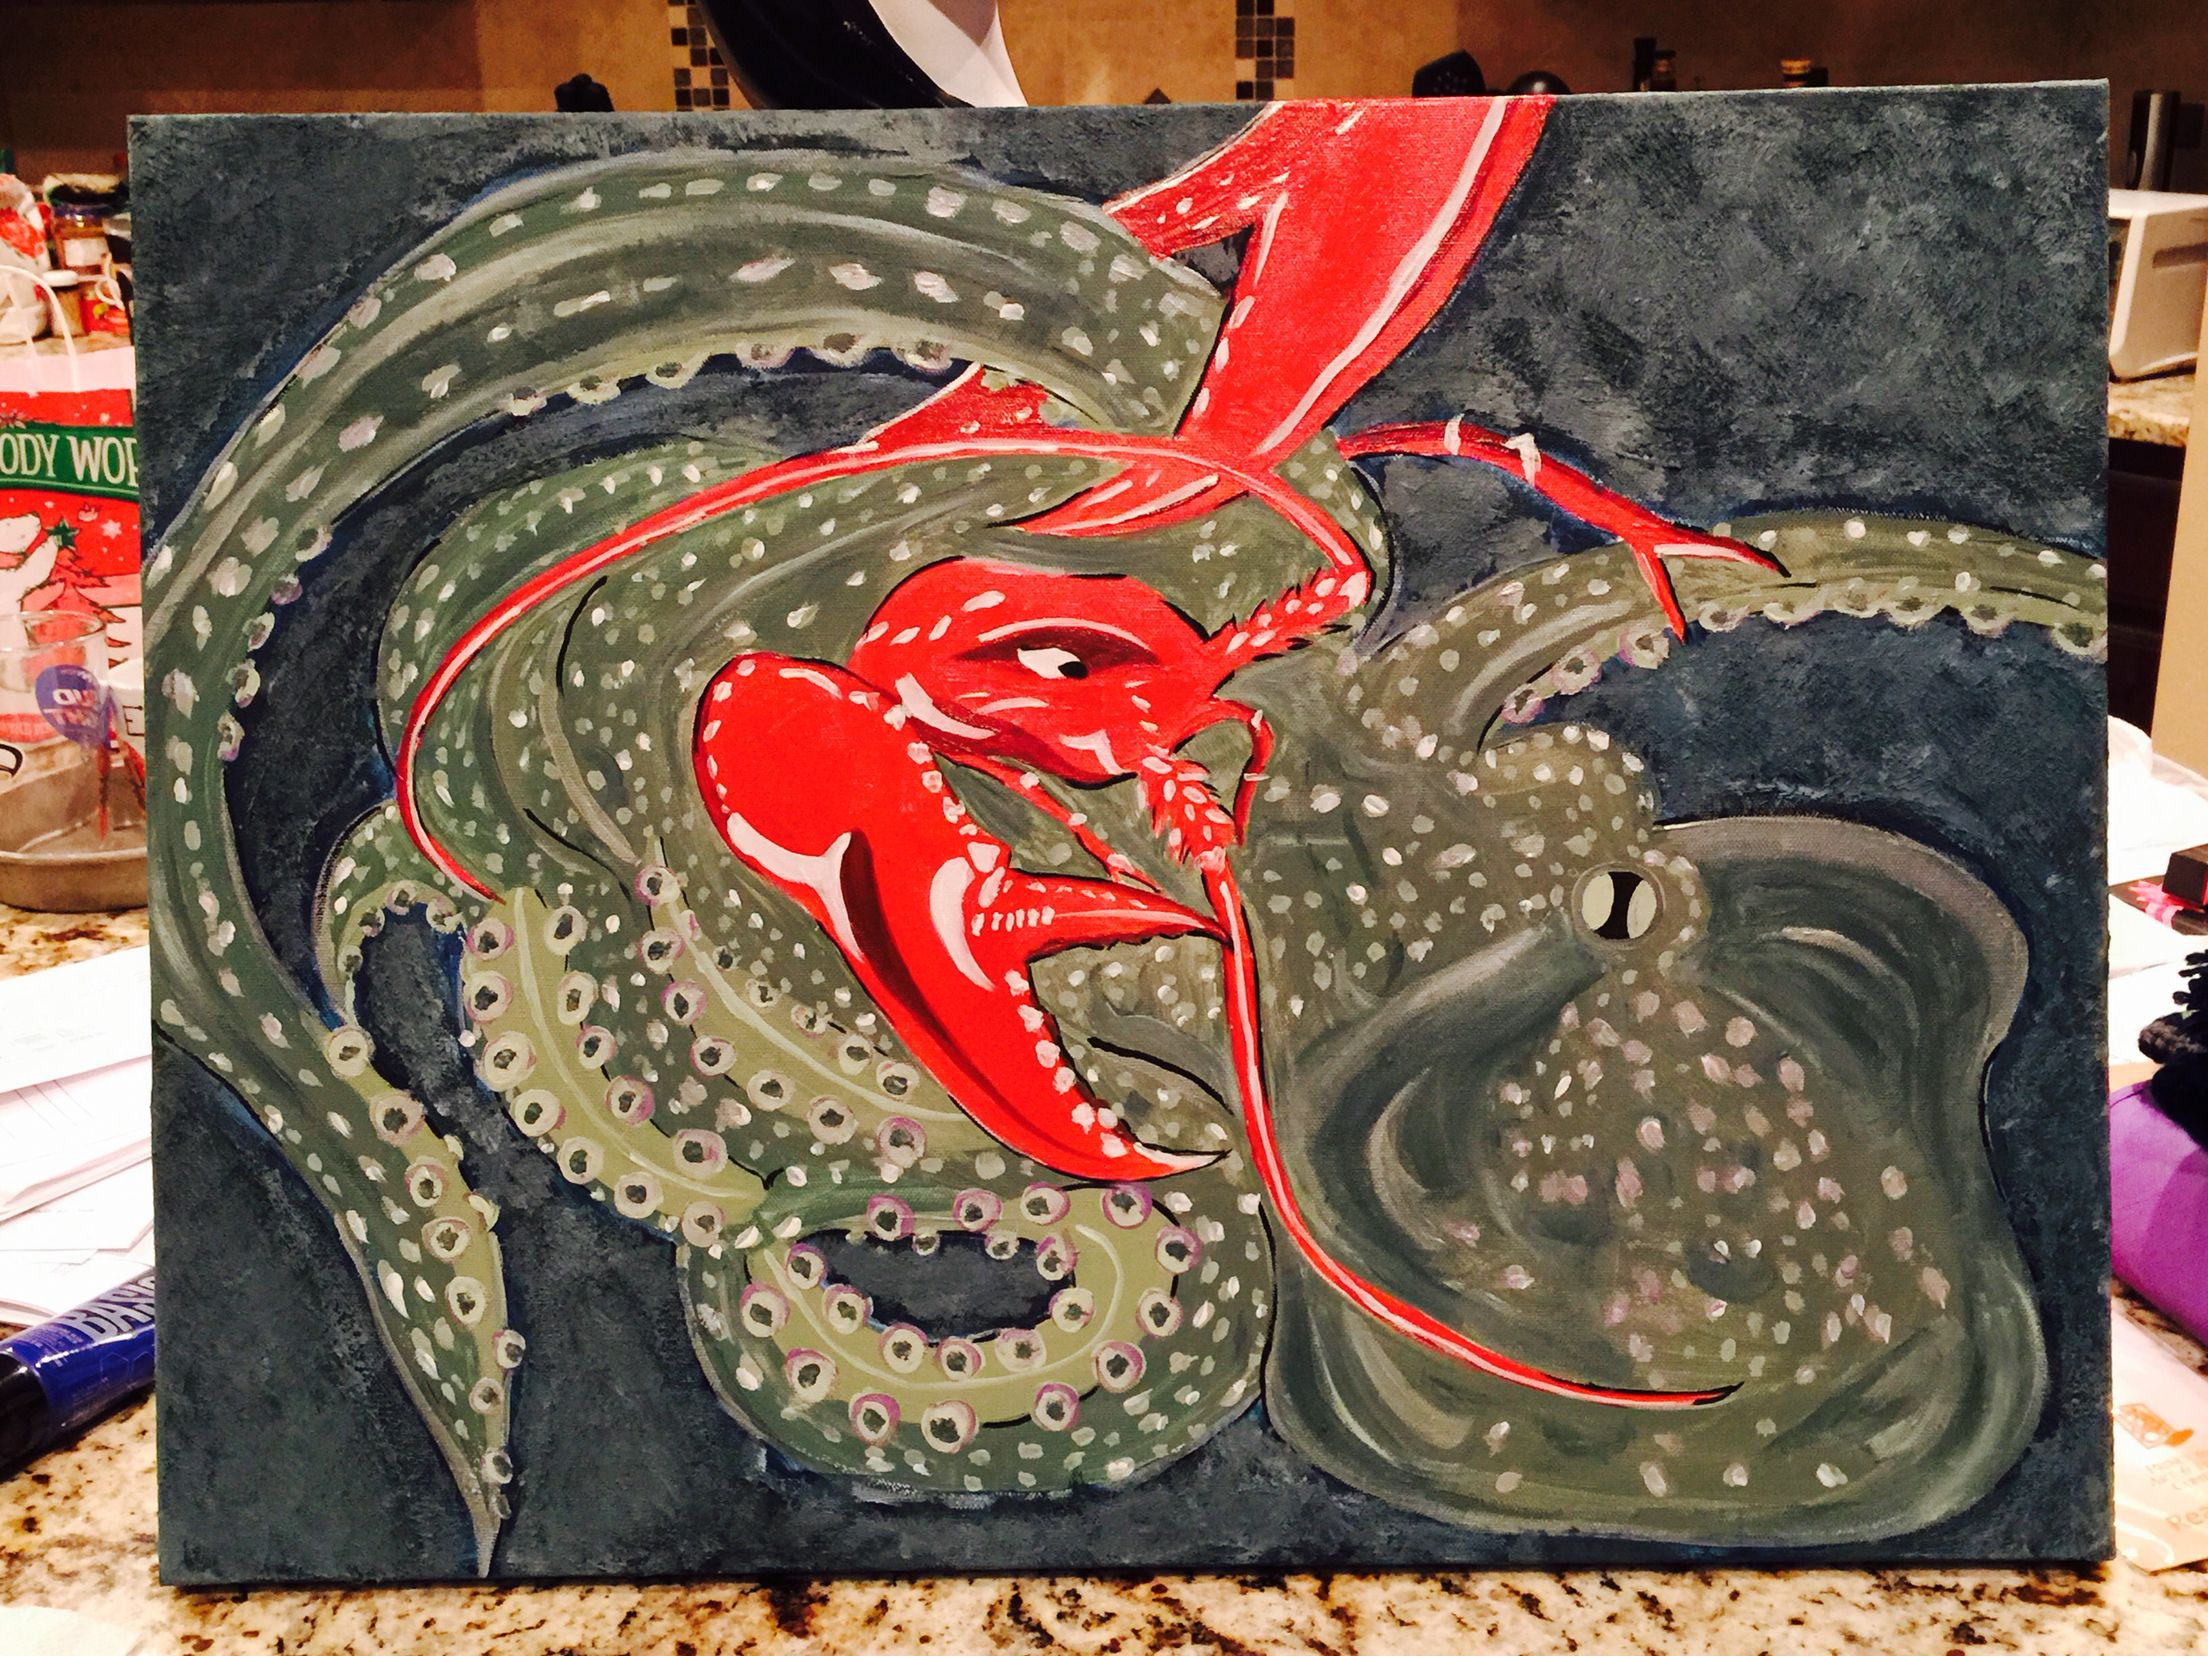 Octopus vs. Lobster Who's winning anyways?-Madel R.